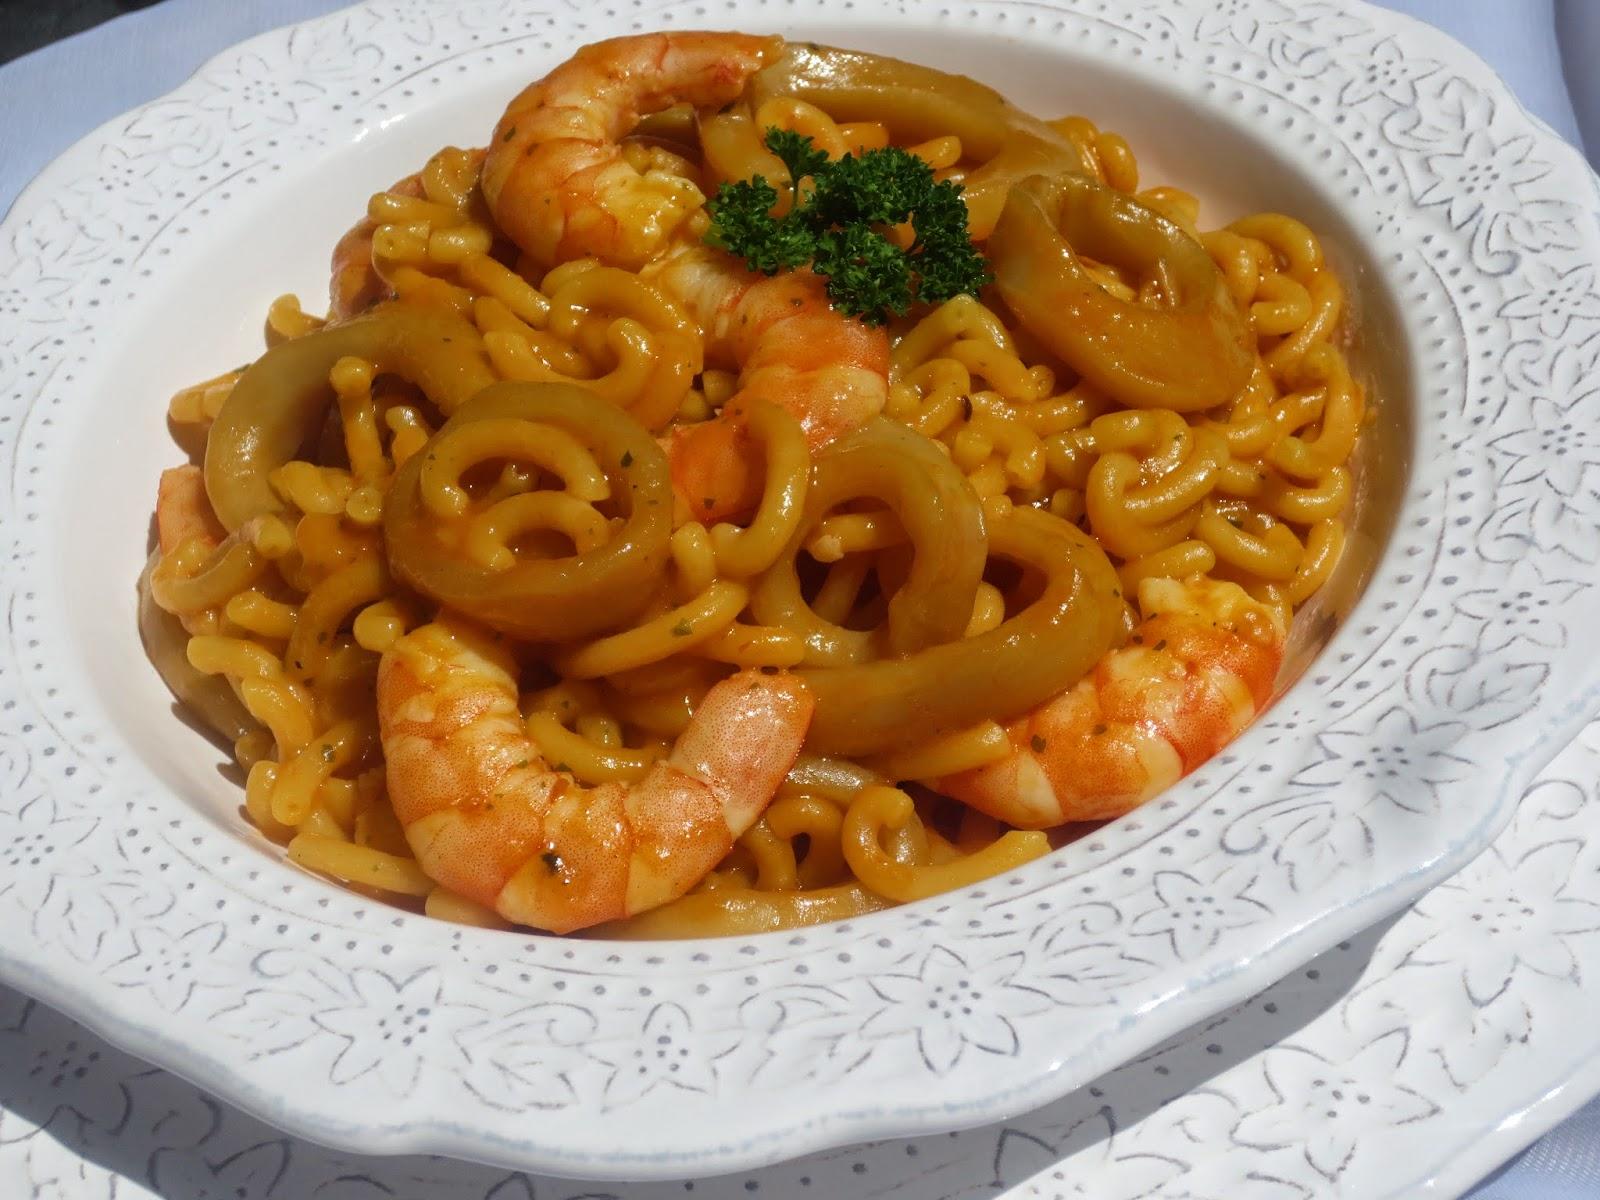 Fideuá de calamares Ana Sevilla cocina tradicional